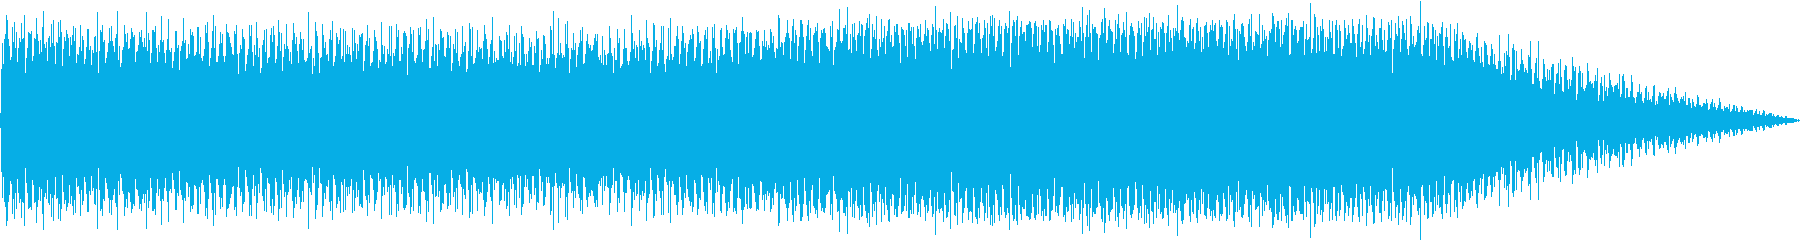 SynthVarious EC04...の再生済みの波形